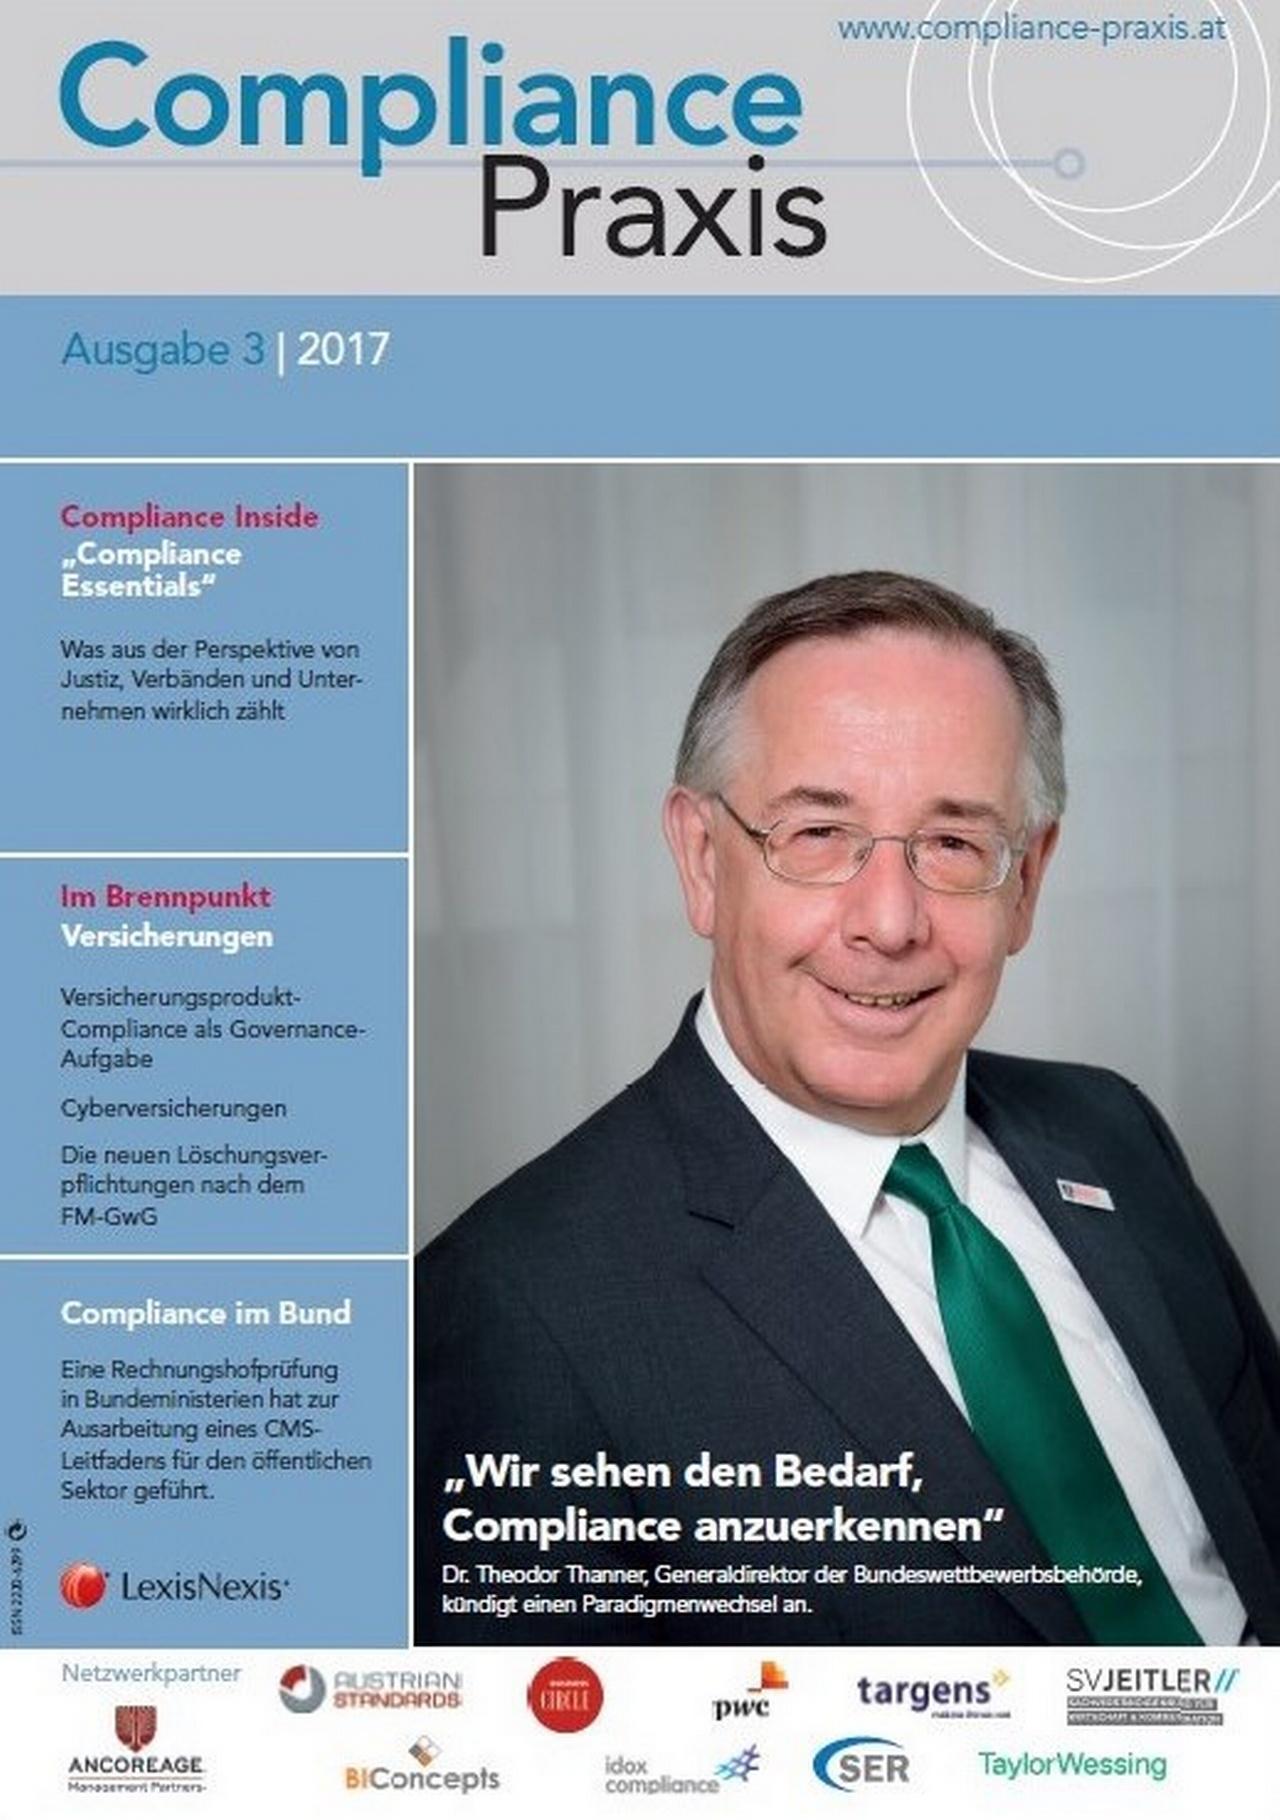 Cover von Compliance Praxis Ausgabe 3/2017, © LexisNexis